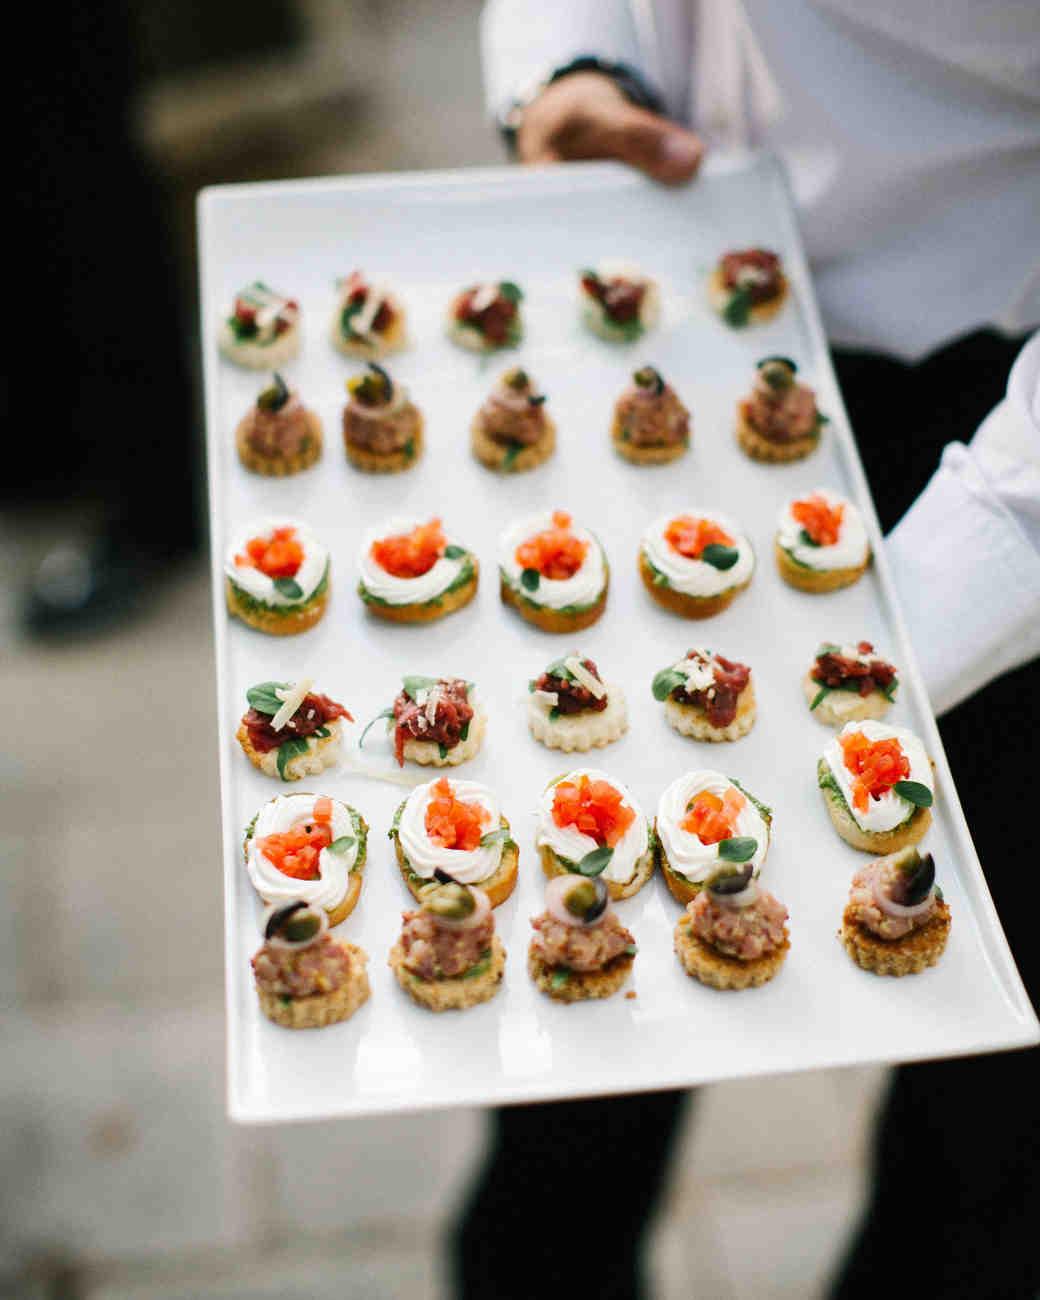 melissa-mike-wedding-appetizers-0169-s112764-0316.jpg